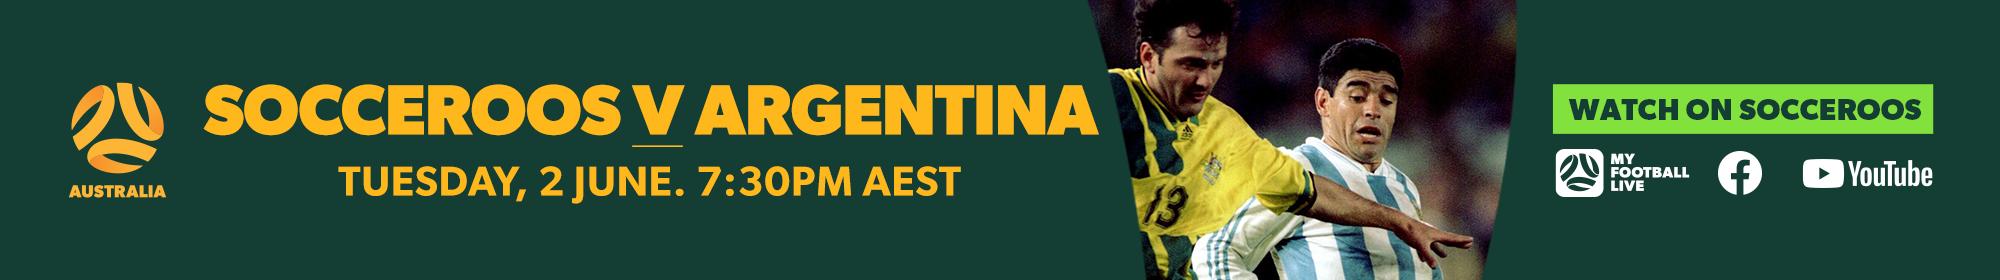 Socceroos Australia v Argentina Thin Banner